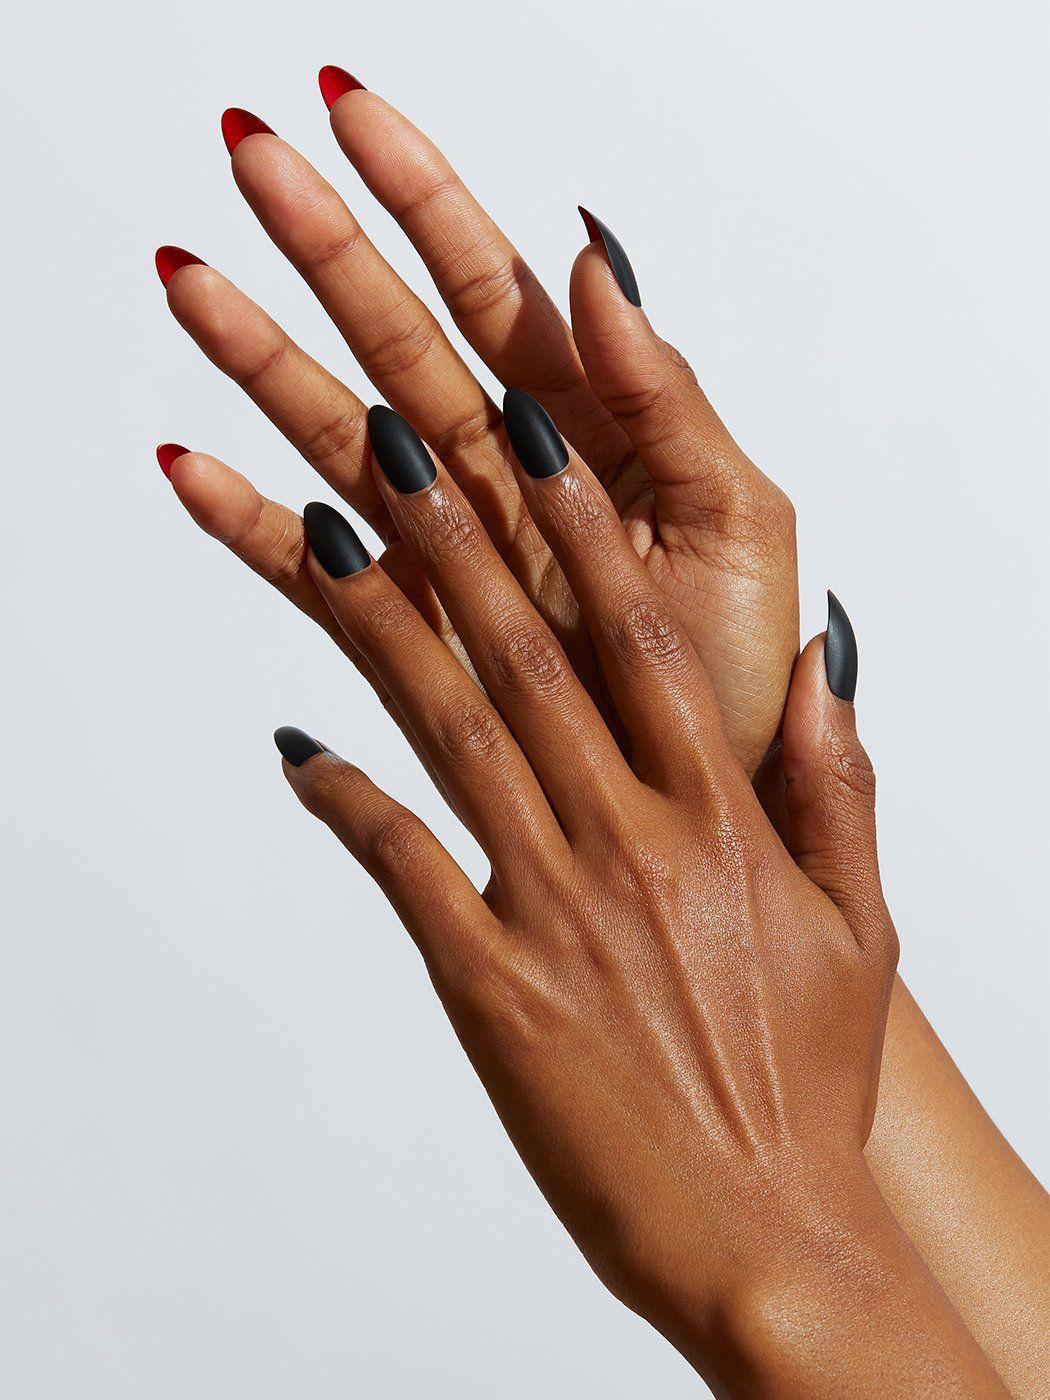 Cvs Press On Nails : press, nails, Press-On, Nails